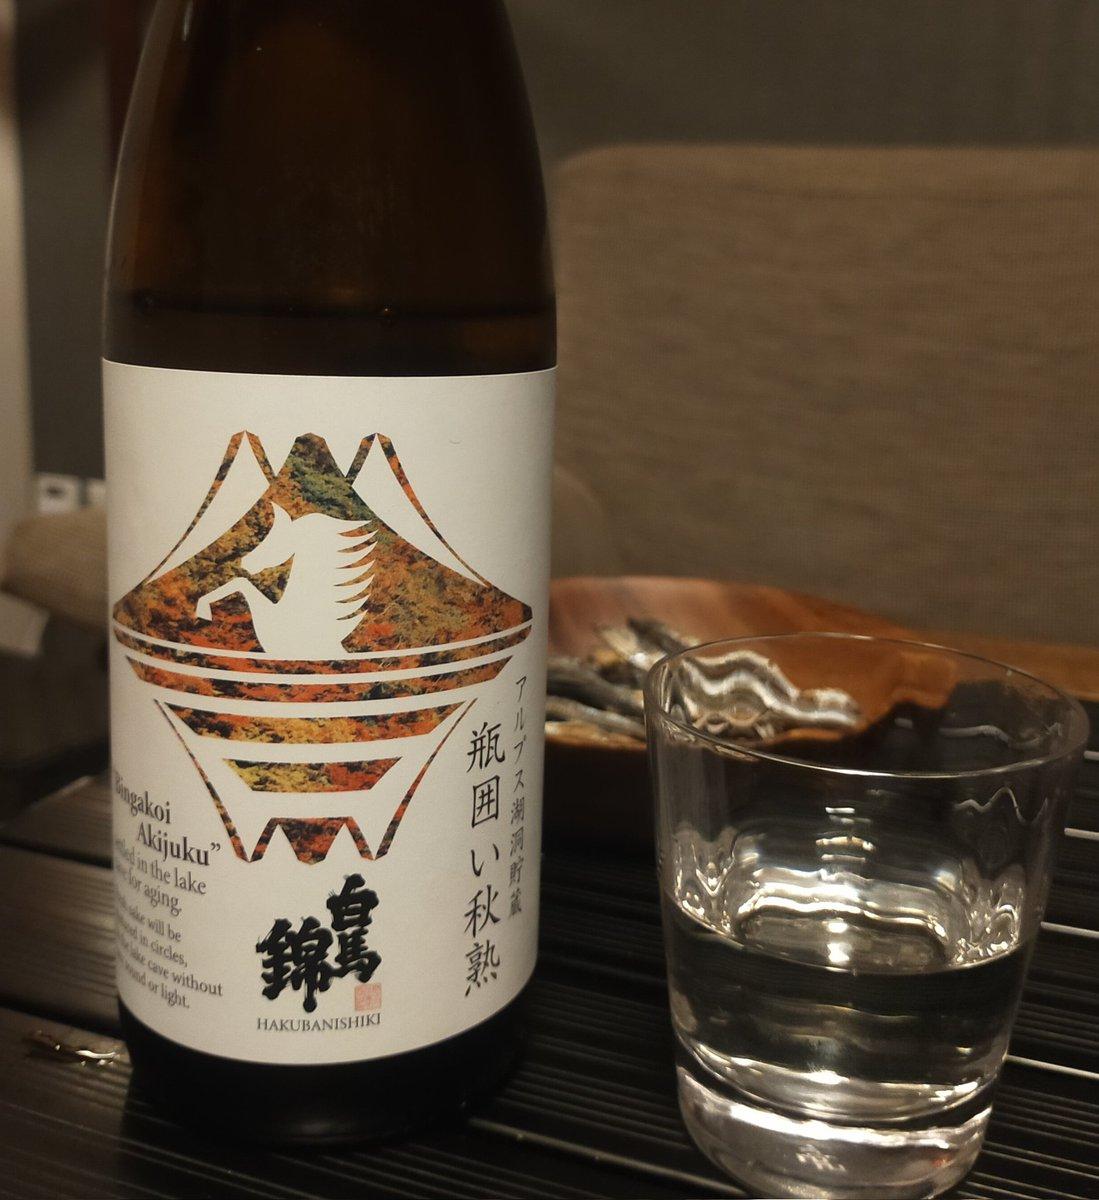 test ツイッターメディア - 「白馬錦 アルプス湖洞貯蔵 瓶囲い秋熟 純米吟醸」 舌や口の中でしっかり重みを感じる旨さ。 #日本酒 #酒 #白馬錦 #地酒 https://t.co/3XGTHbZi1p